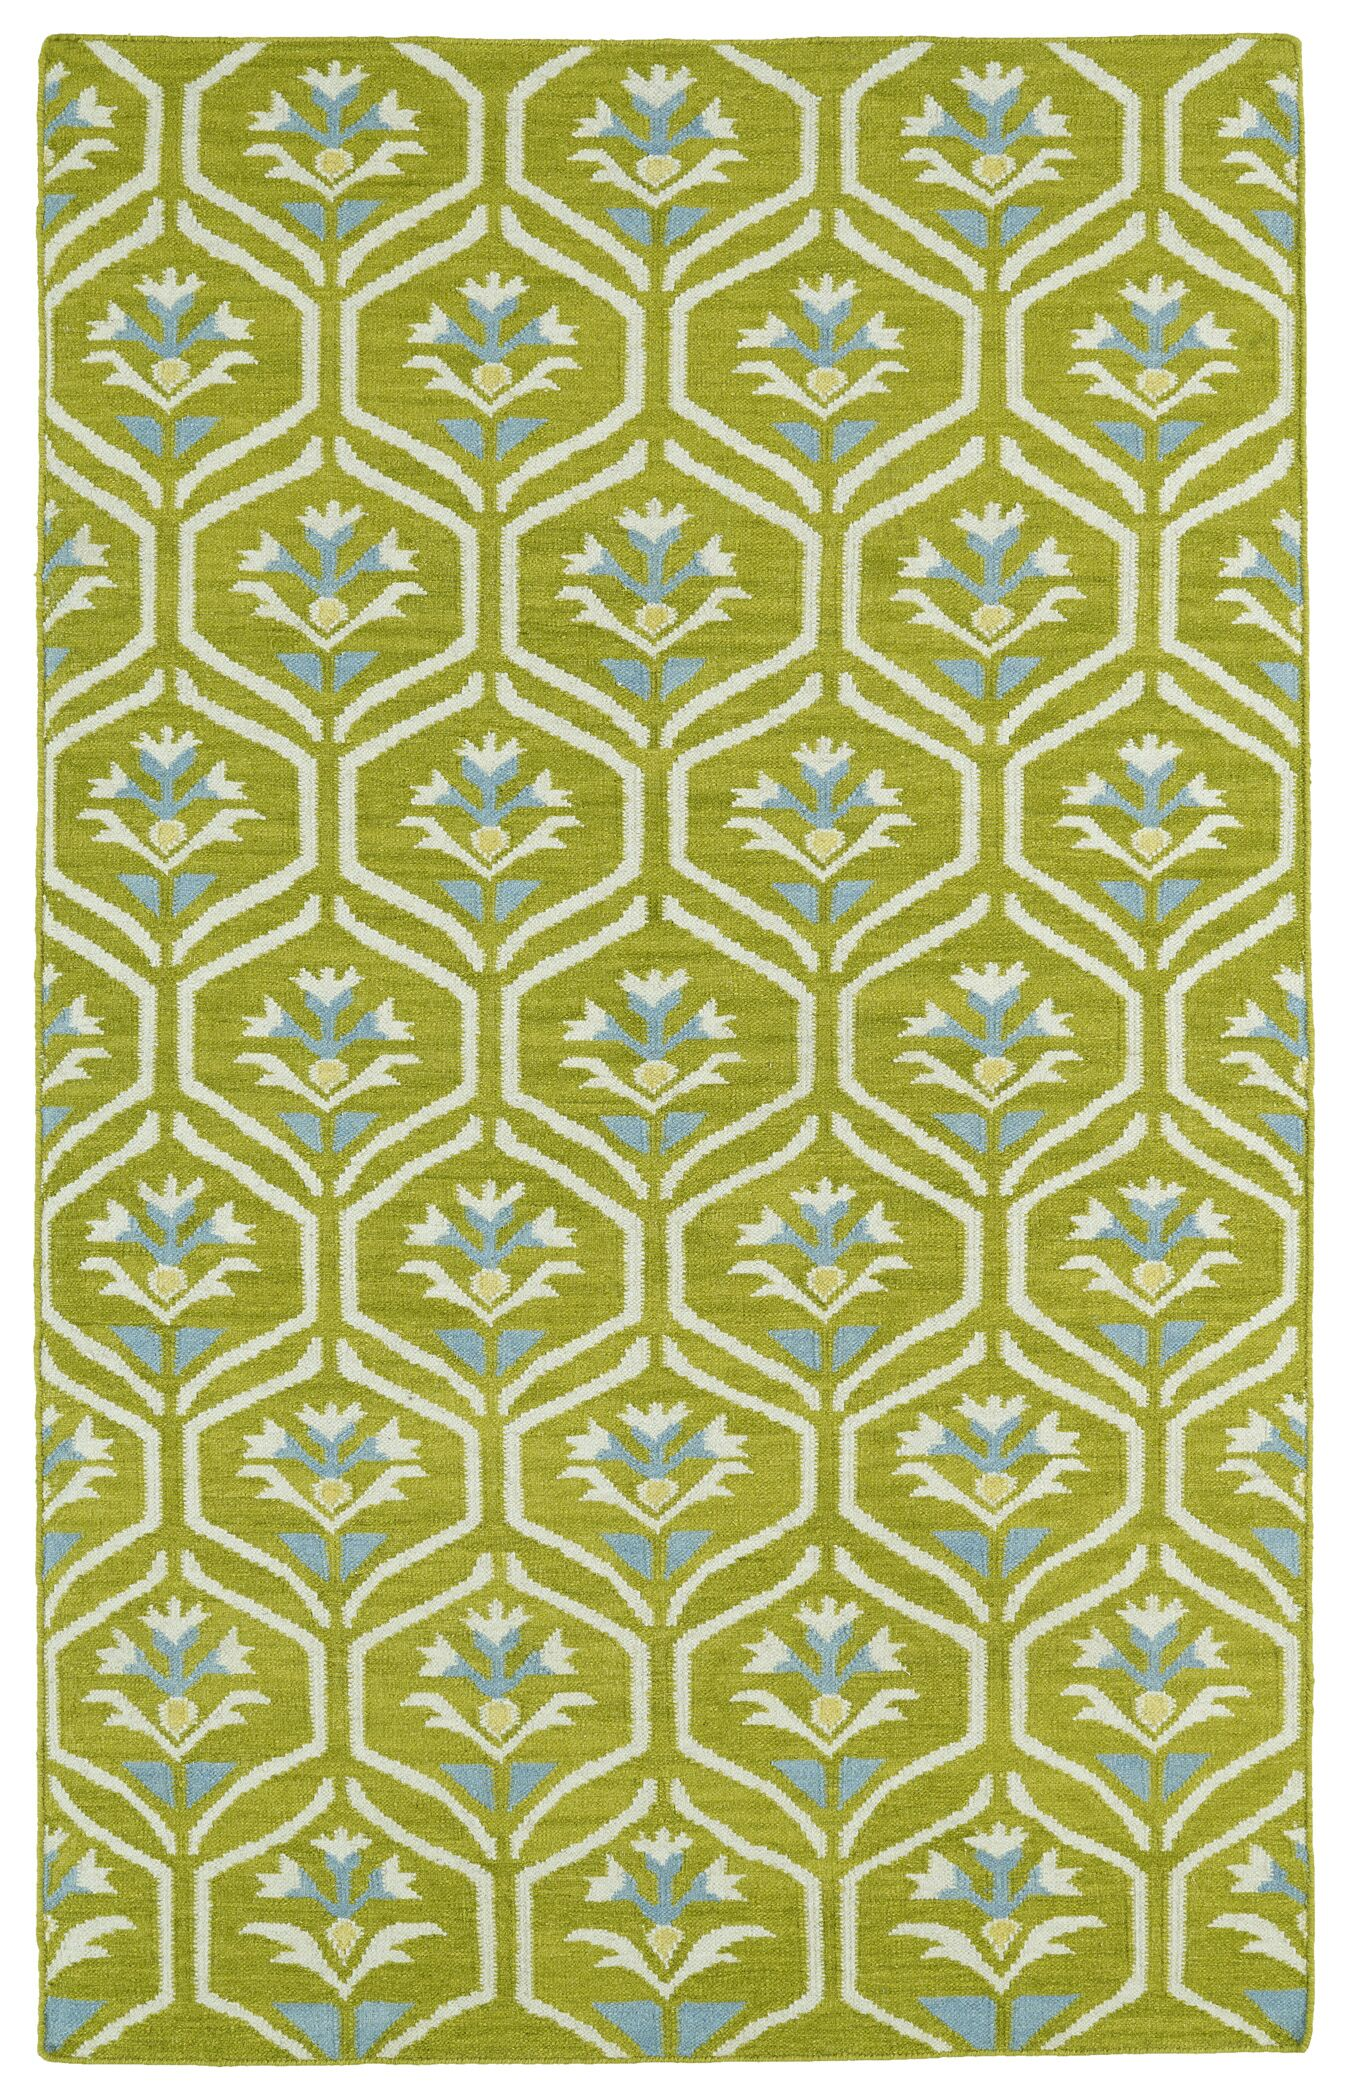 Gillespie Green Geometric Area Rug Rug Size: Rectangle 5' x 8'